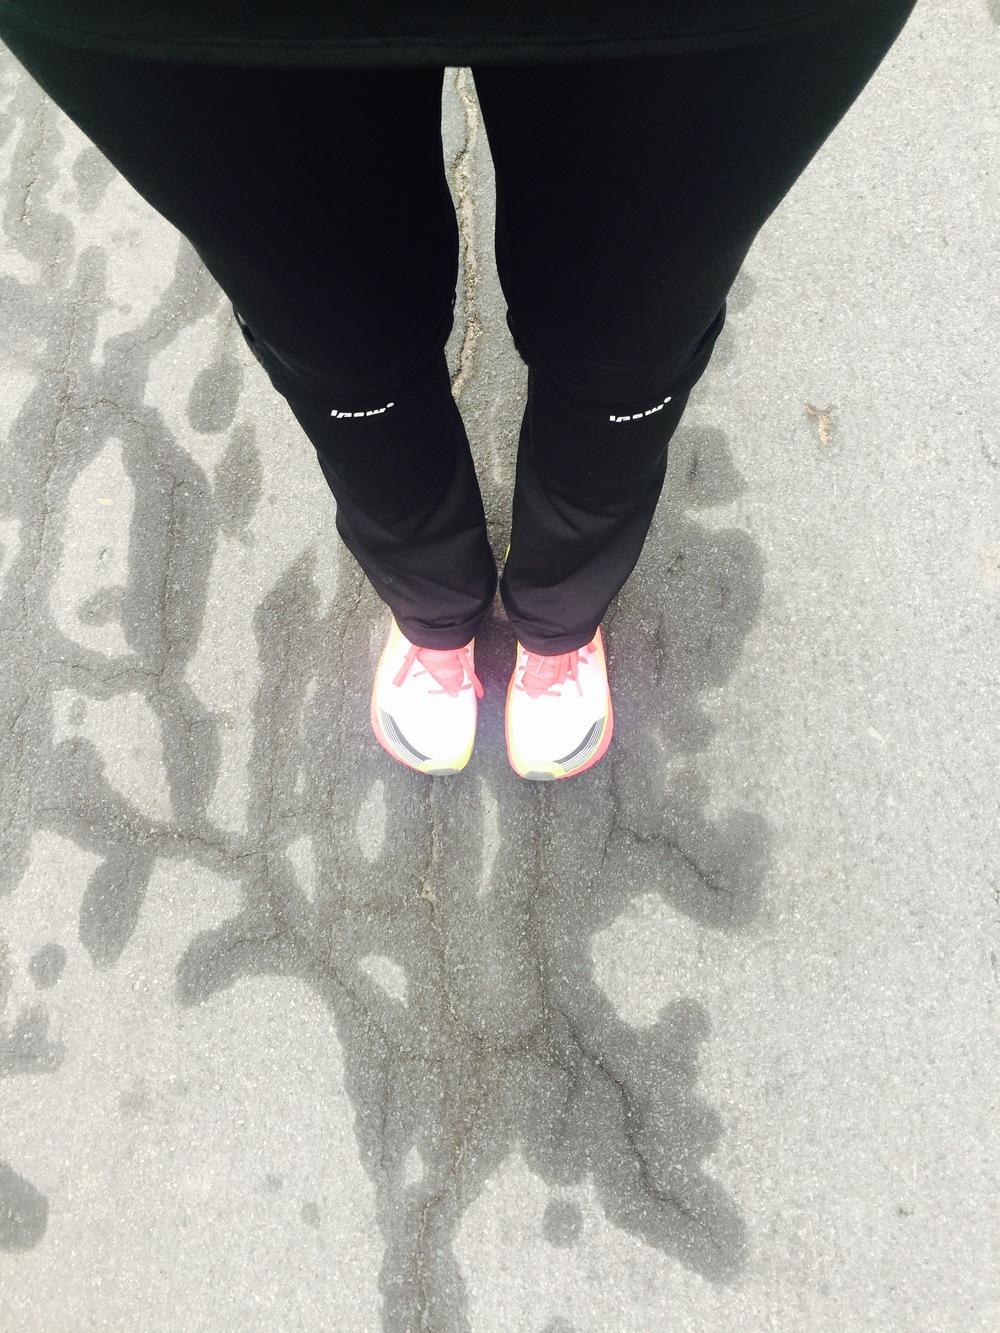 RUNNING NATURE_LEG SELFIE_APRIL_SHELITA BIRCHETT BENASH